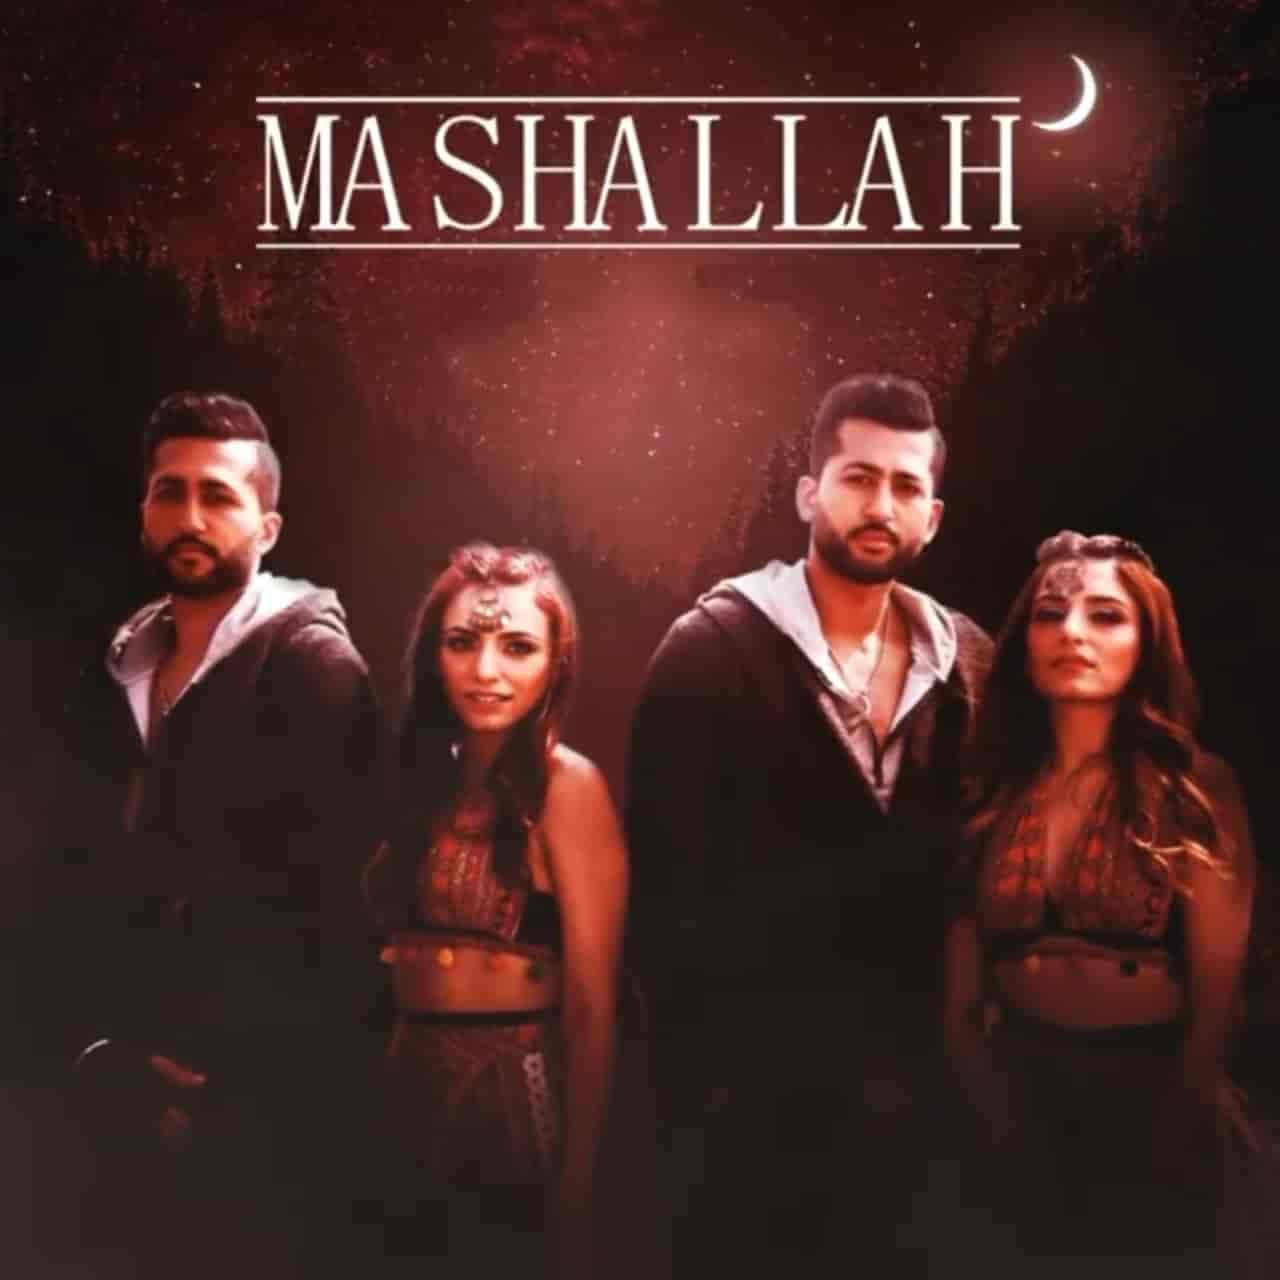 Mashallah Song Image By Sukriti Kakar, Prakriti Kakar & THEMXXNLIGHT